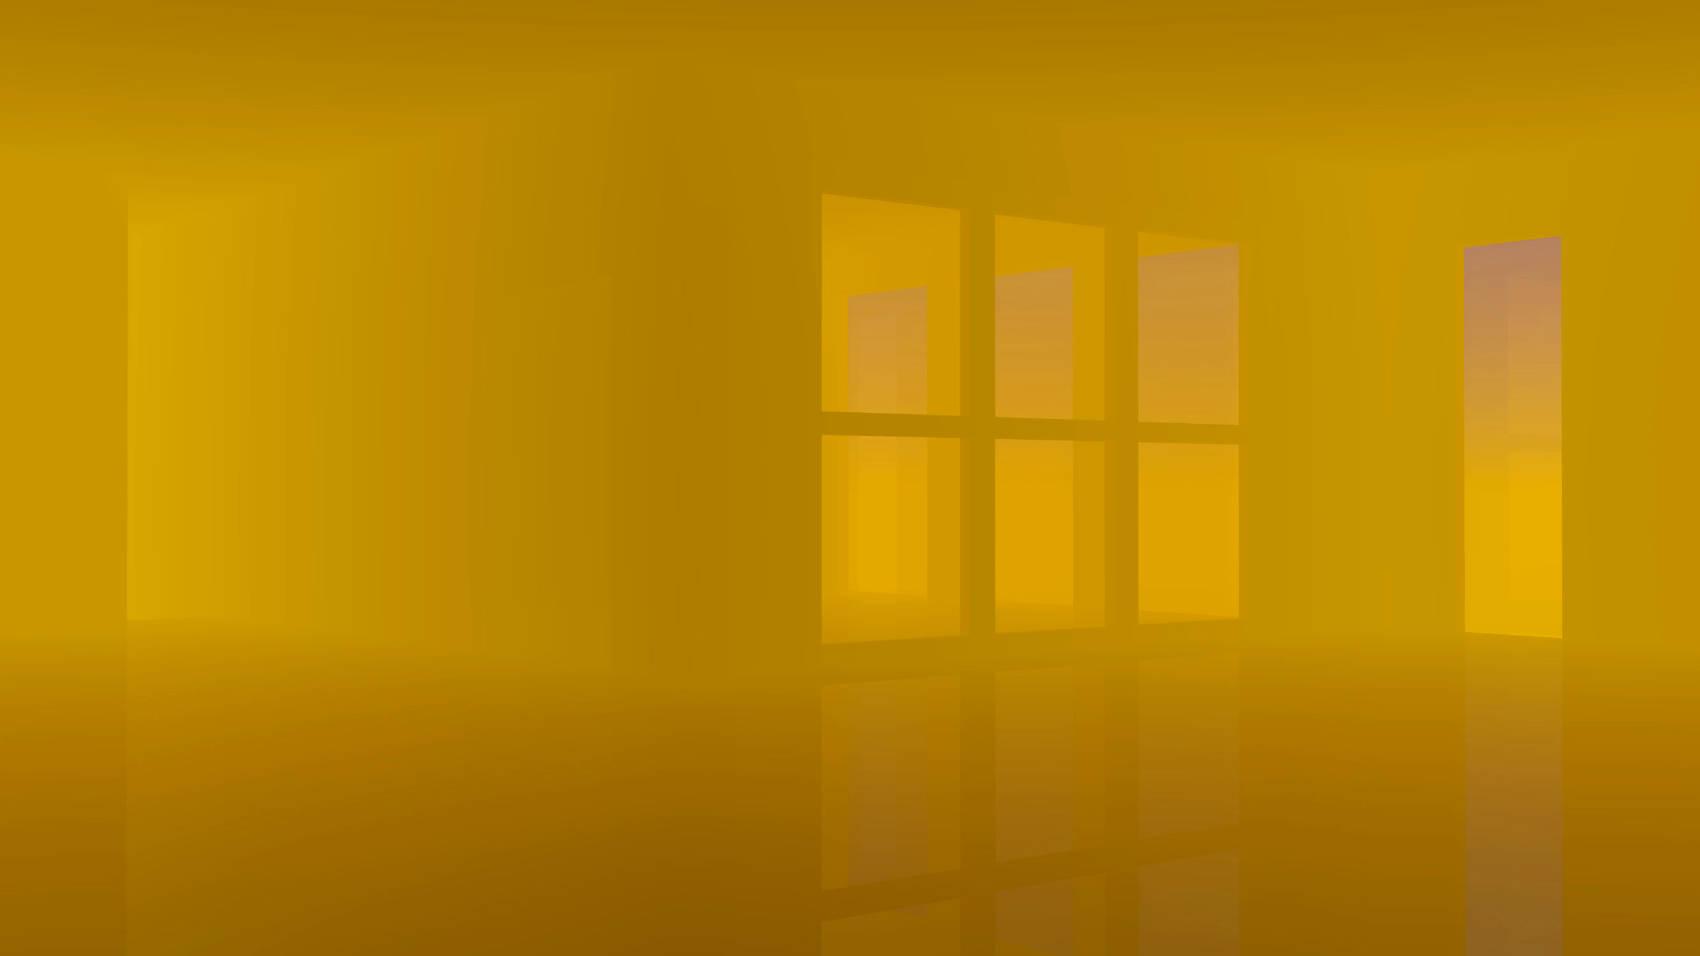 Golden Brown Room, 2017, Jet d'encre, 77 x 137 cm